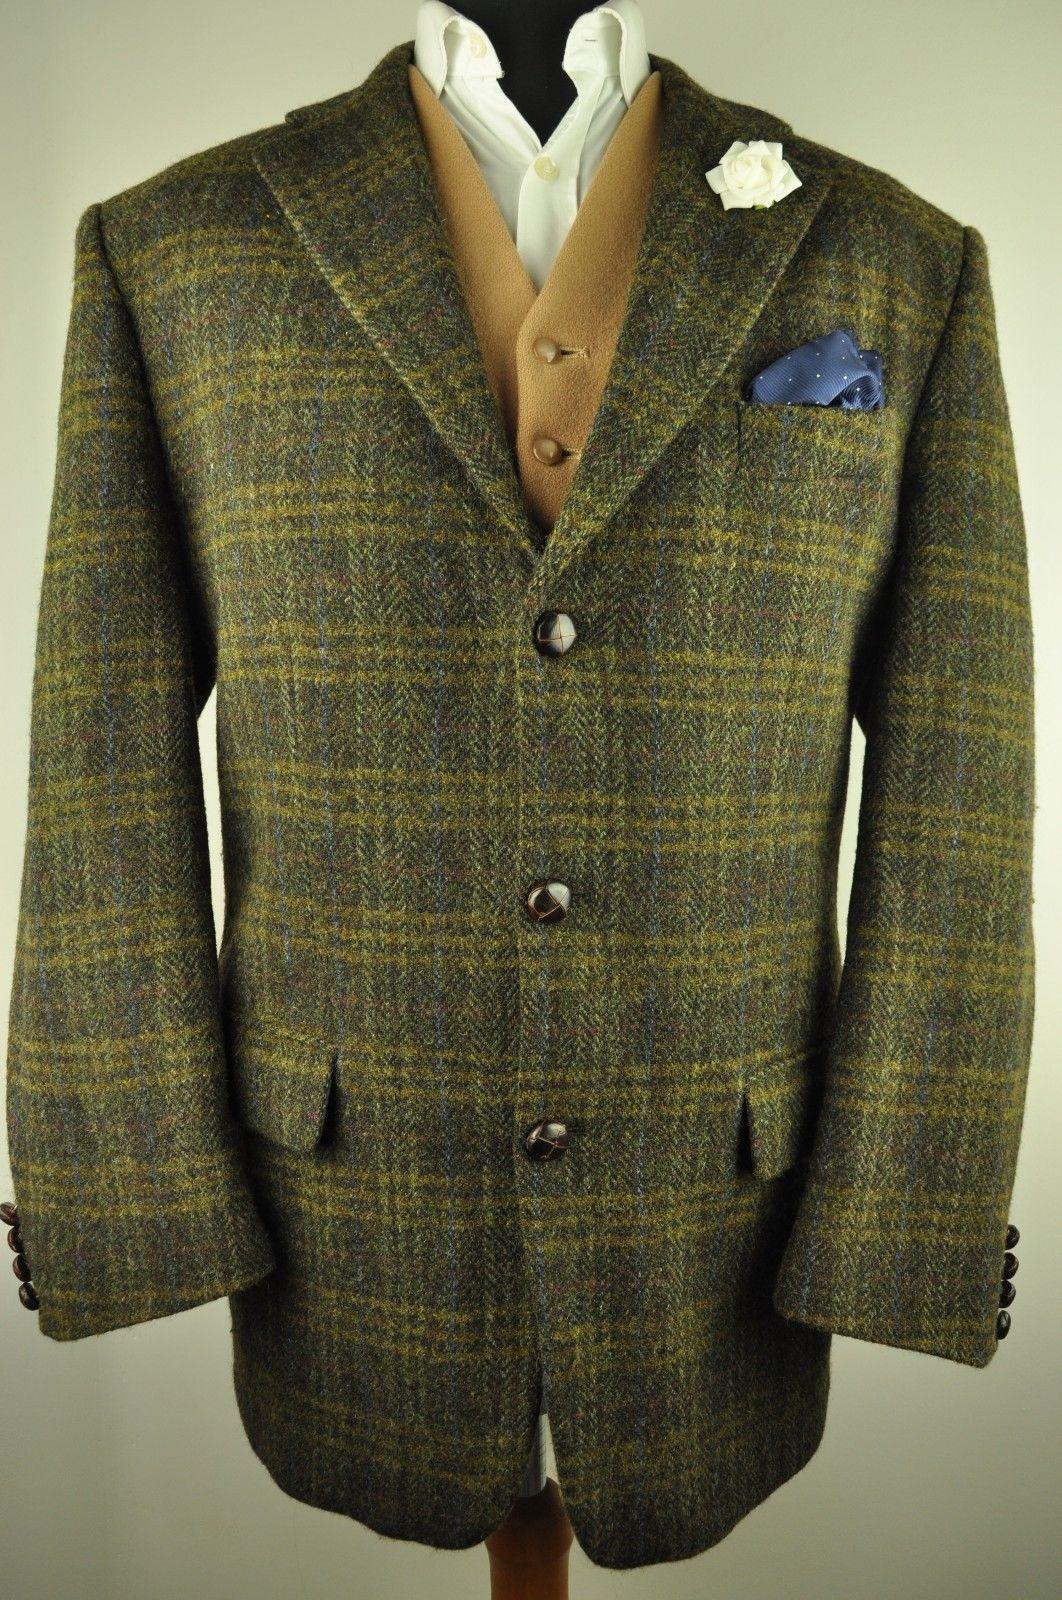 offrir des rabais design intemporel style top Stunning Harris Tweed jacket in a textured green cloth with ...